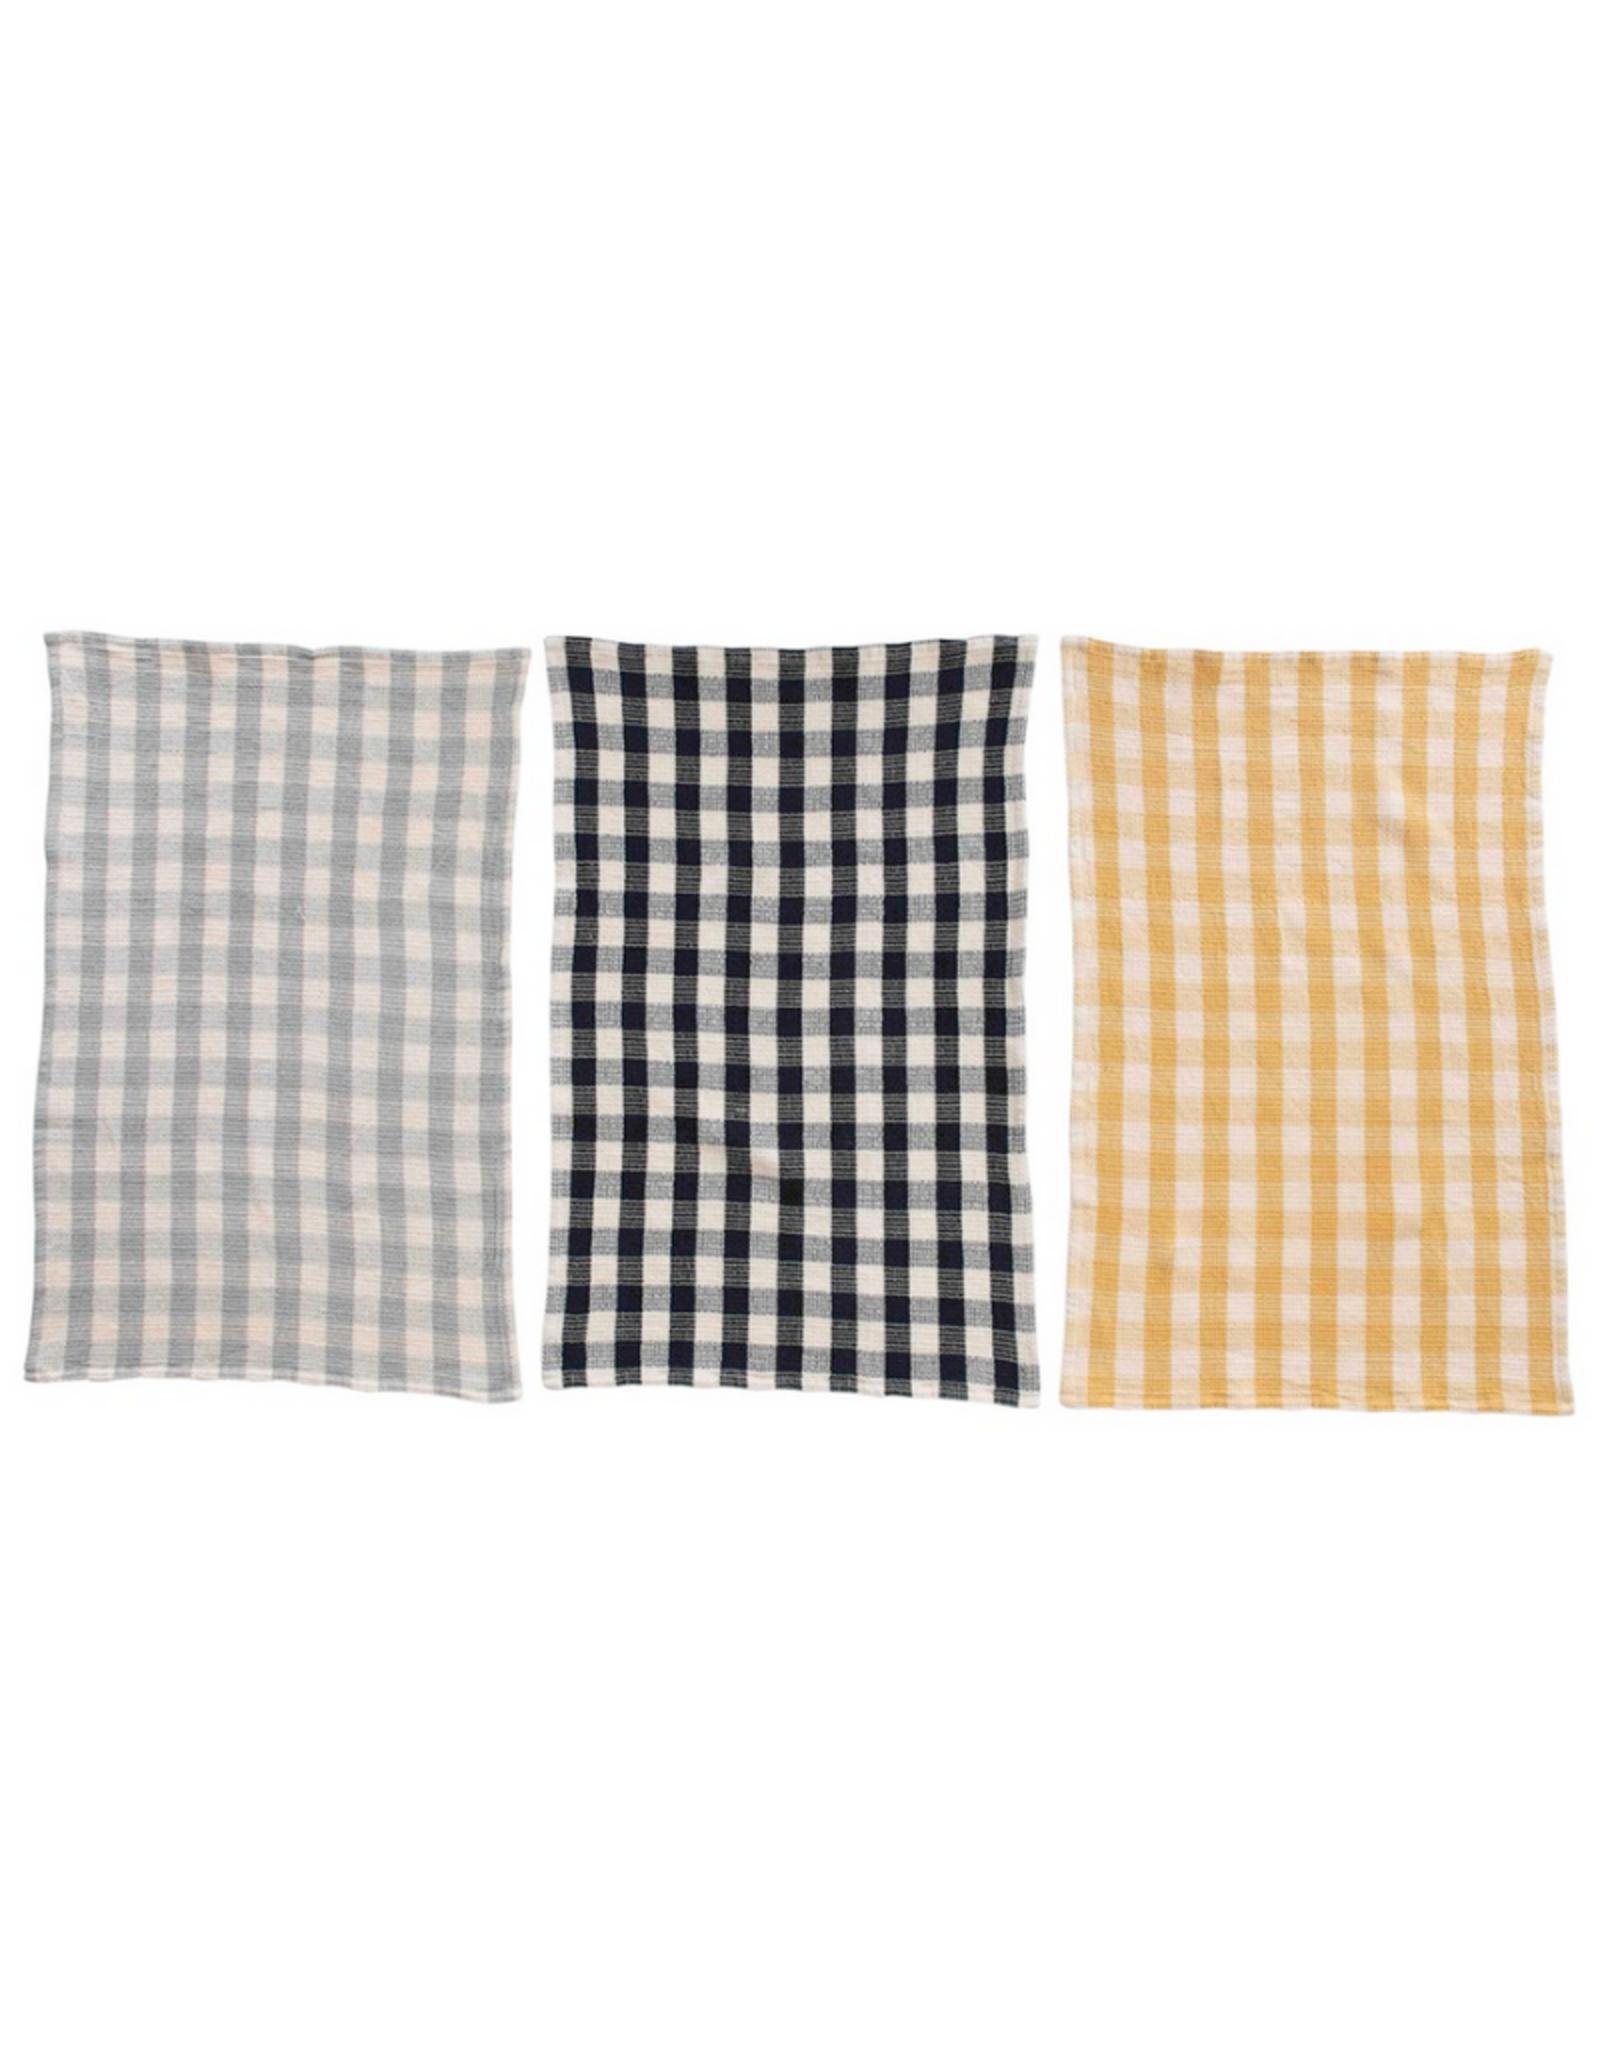 "TEA TOWELS-COTTON, GINGHAM, SET OF 3, 28"" X 18"""